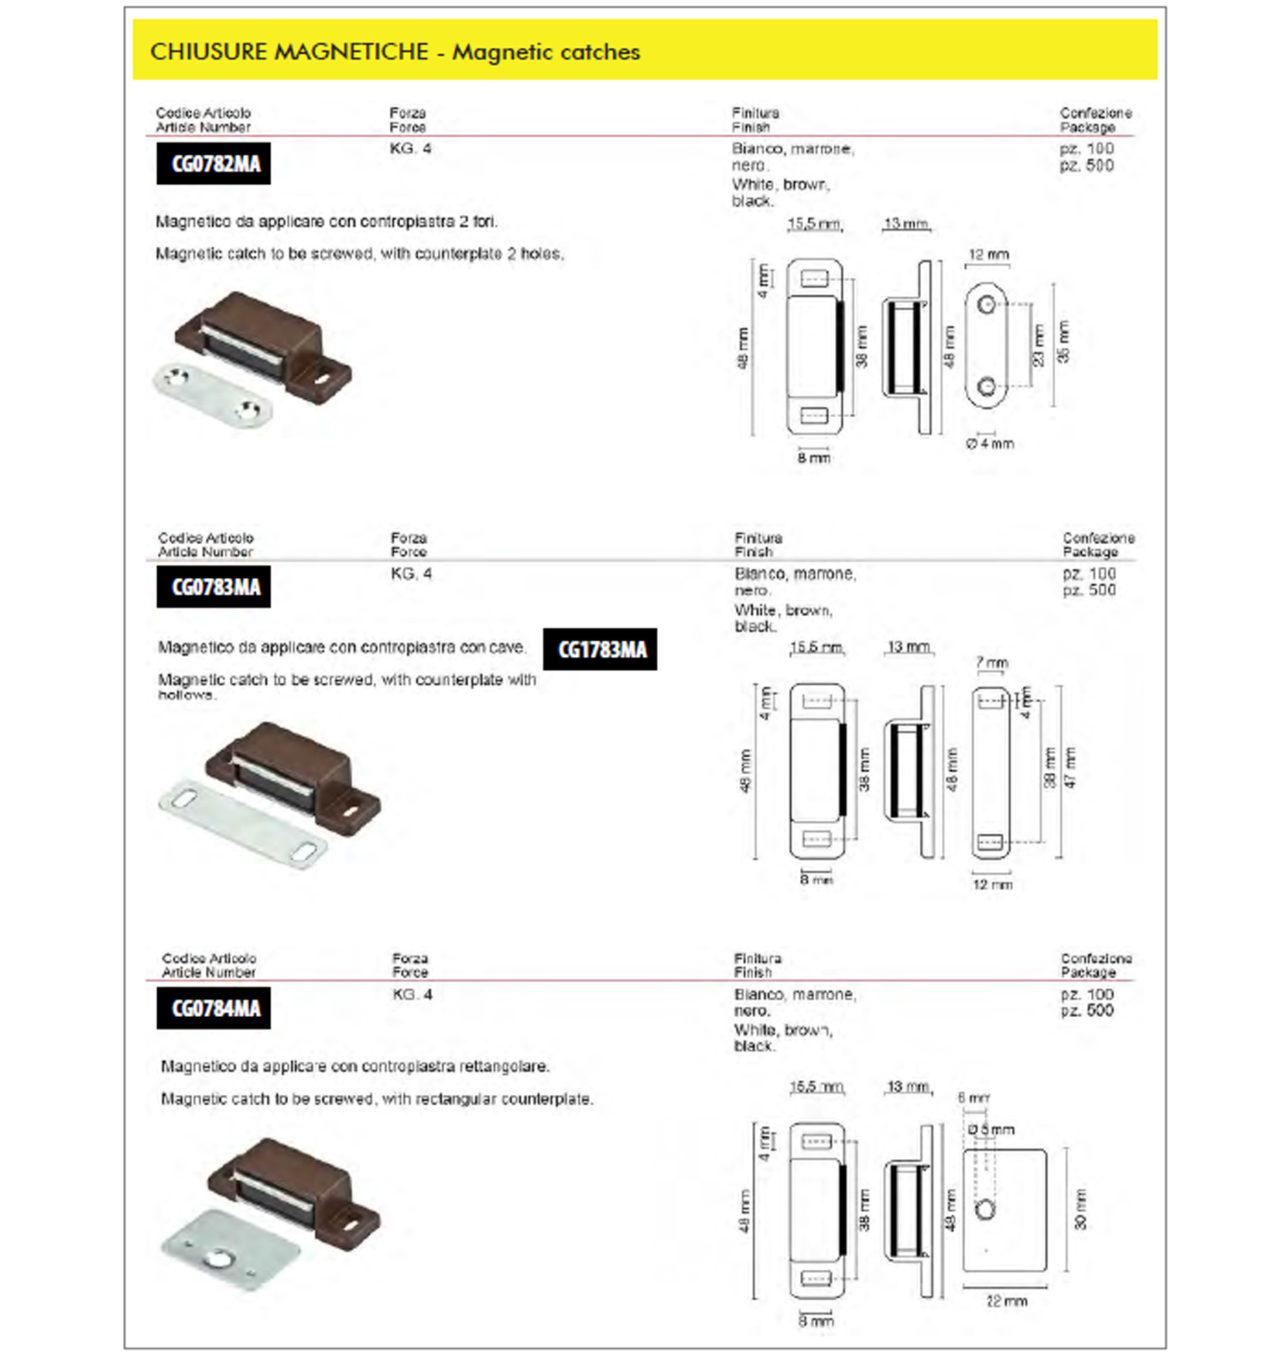 Pagine-da-CG-ferramenta_magnetici_IIE-1280x1369.jpg